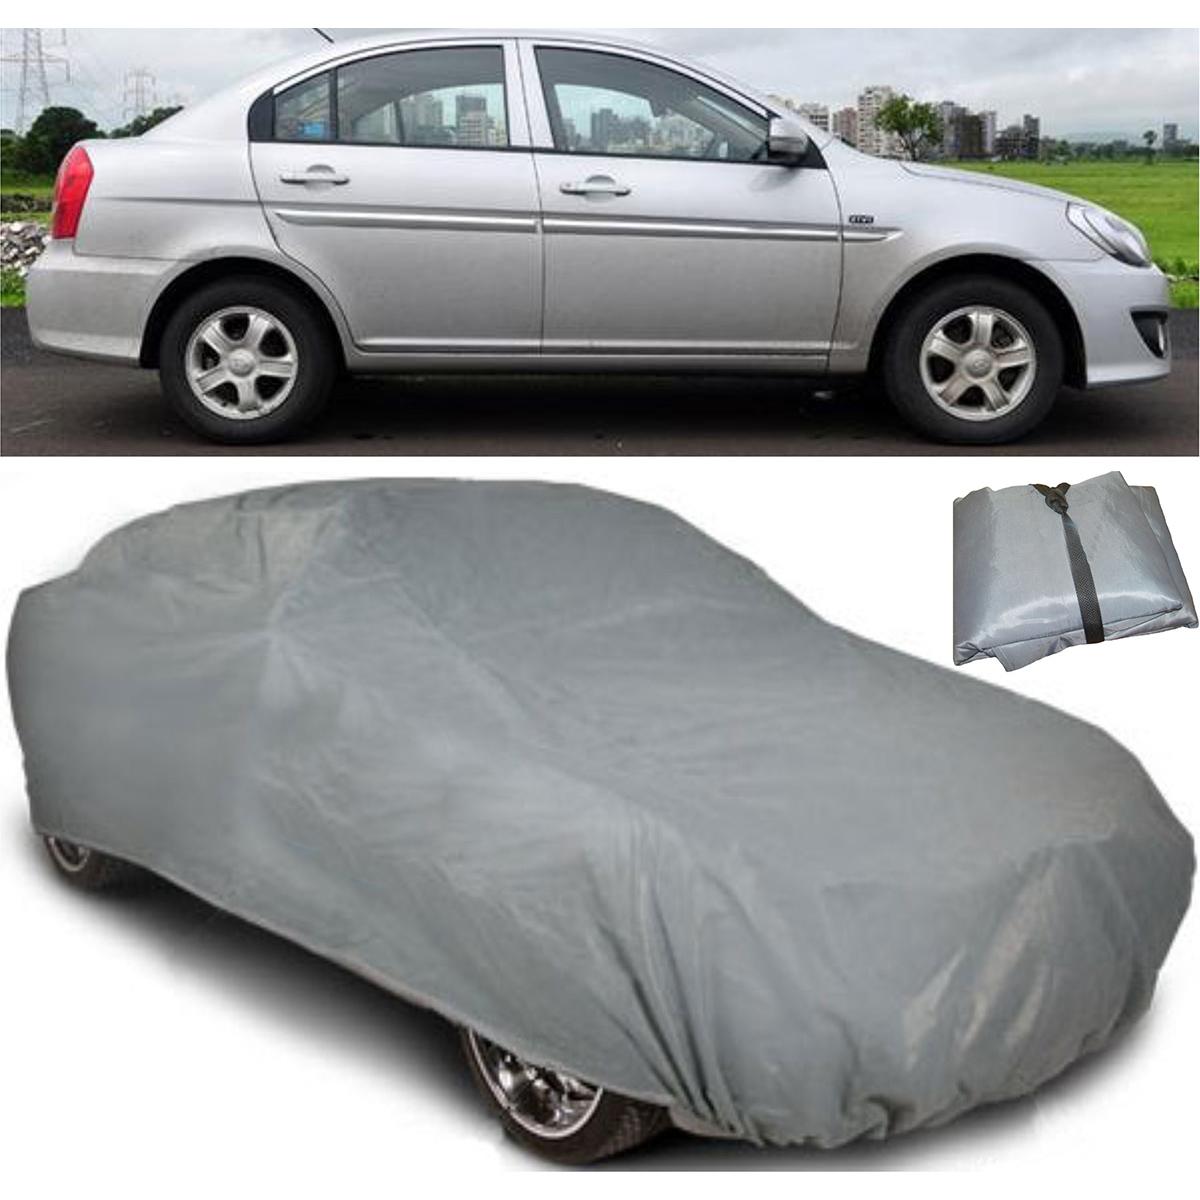 Buy digitru car body cover for hyundai verna dark grey online at best price in india on